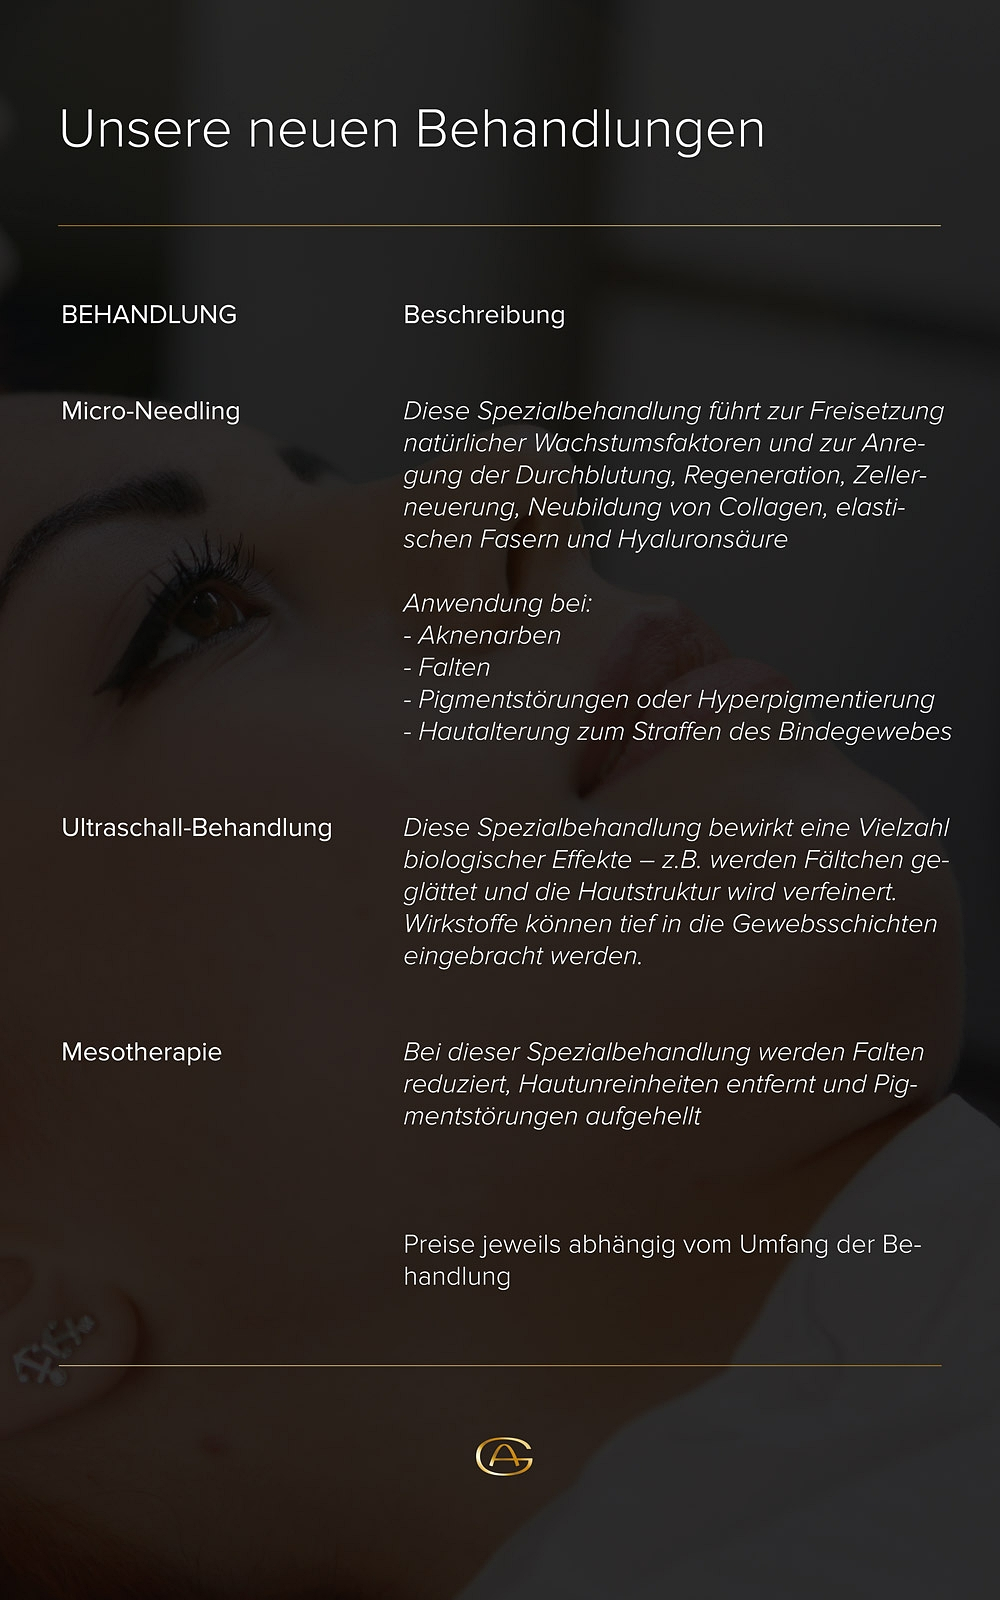 garzareck_cosmetics_preise_news_web01.jpg